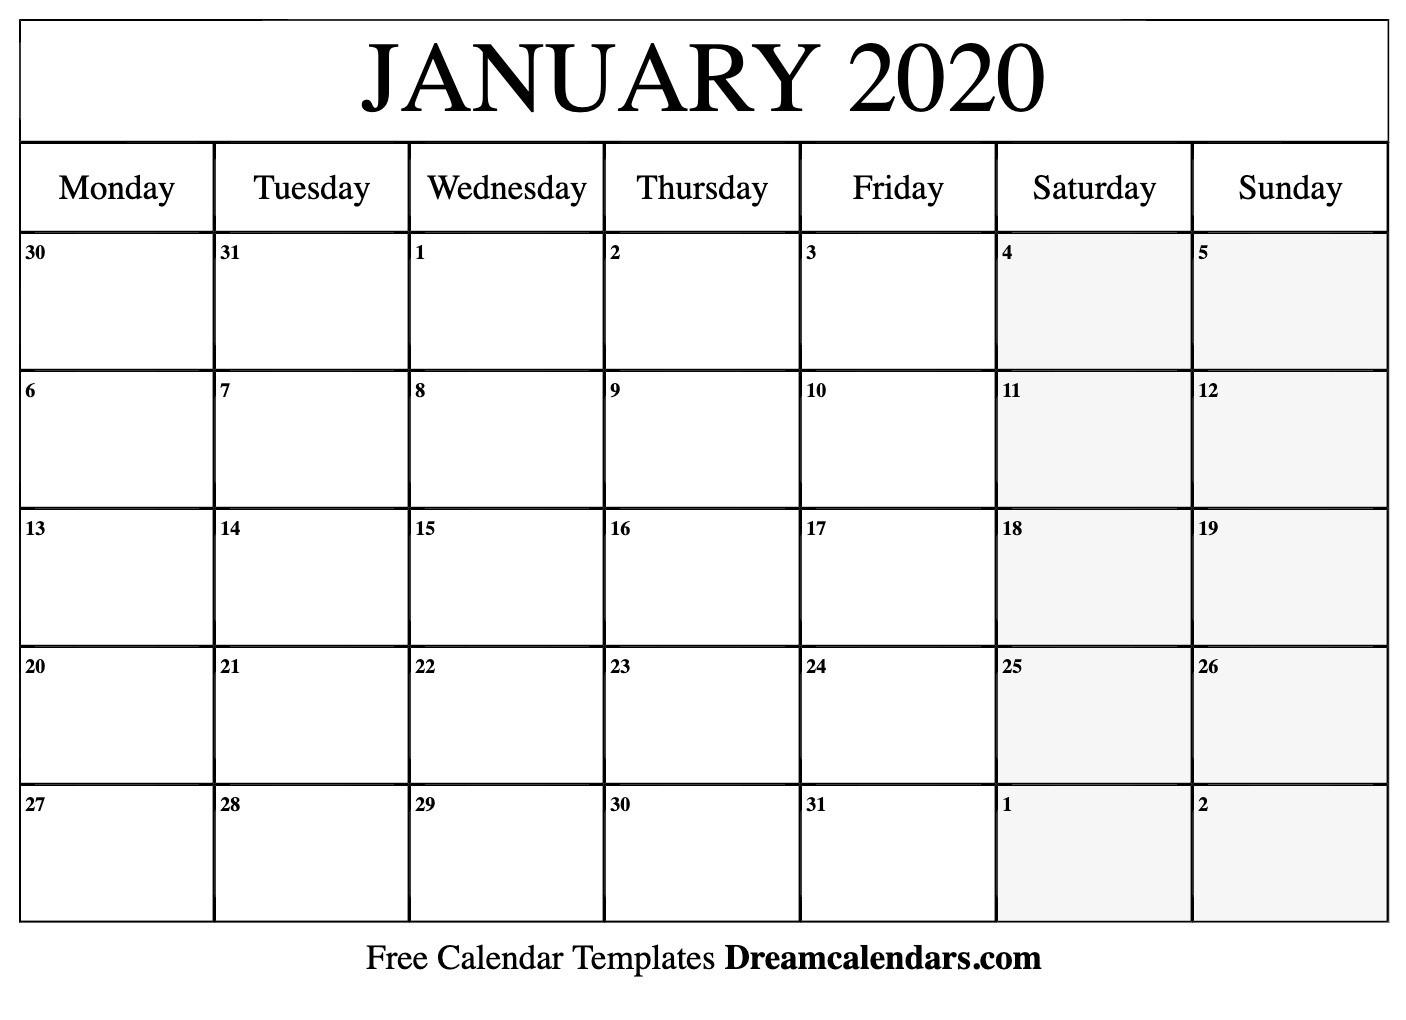 Printable January 2020 Calendar-January 2020 Calendar Print